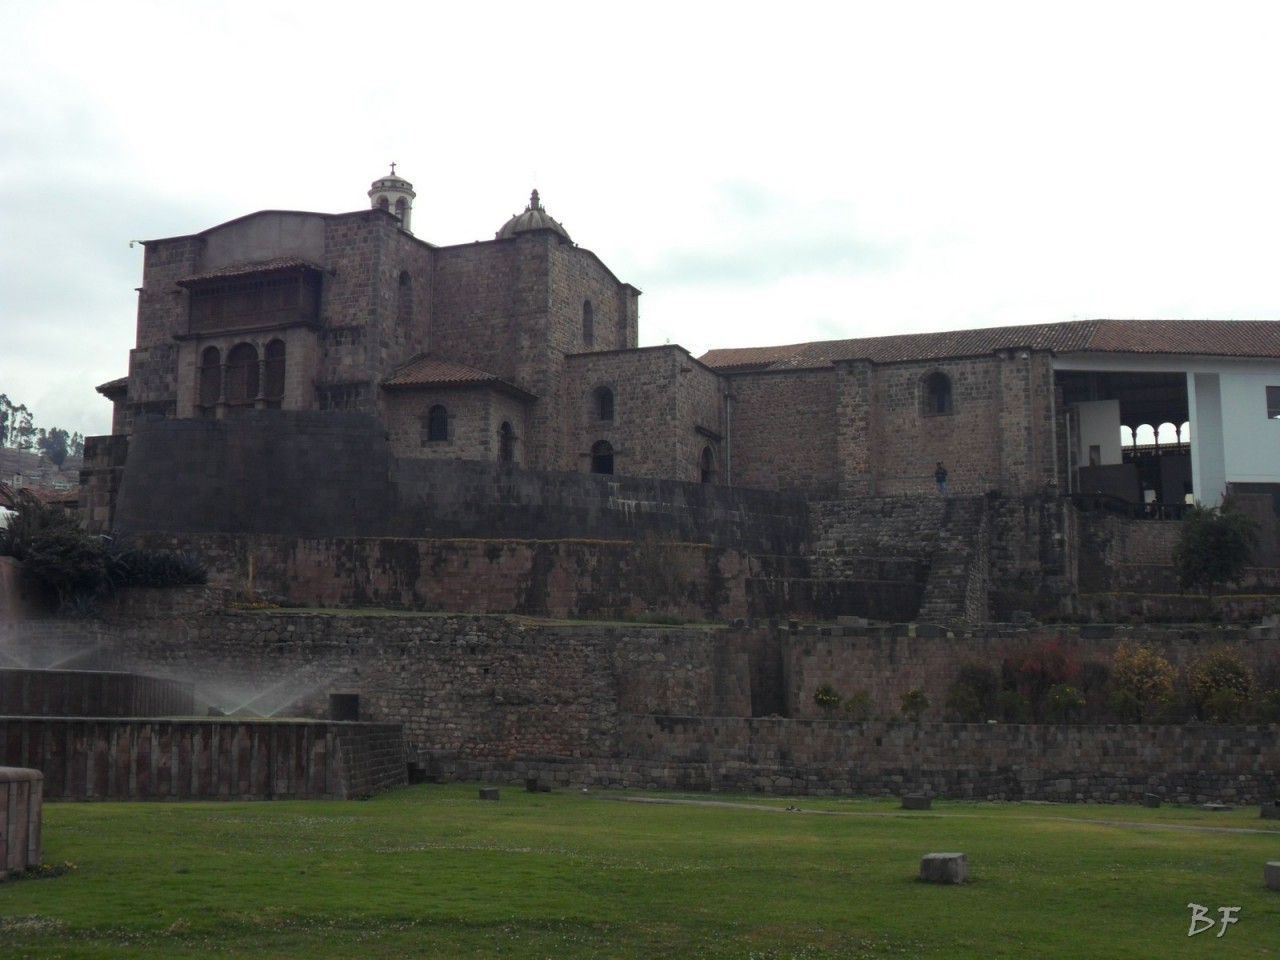 Mura-Poligonali-Megaliti-Tempio-Coricancha-Cusco-Perù-65